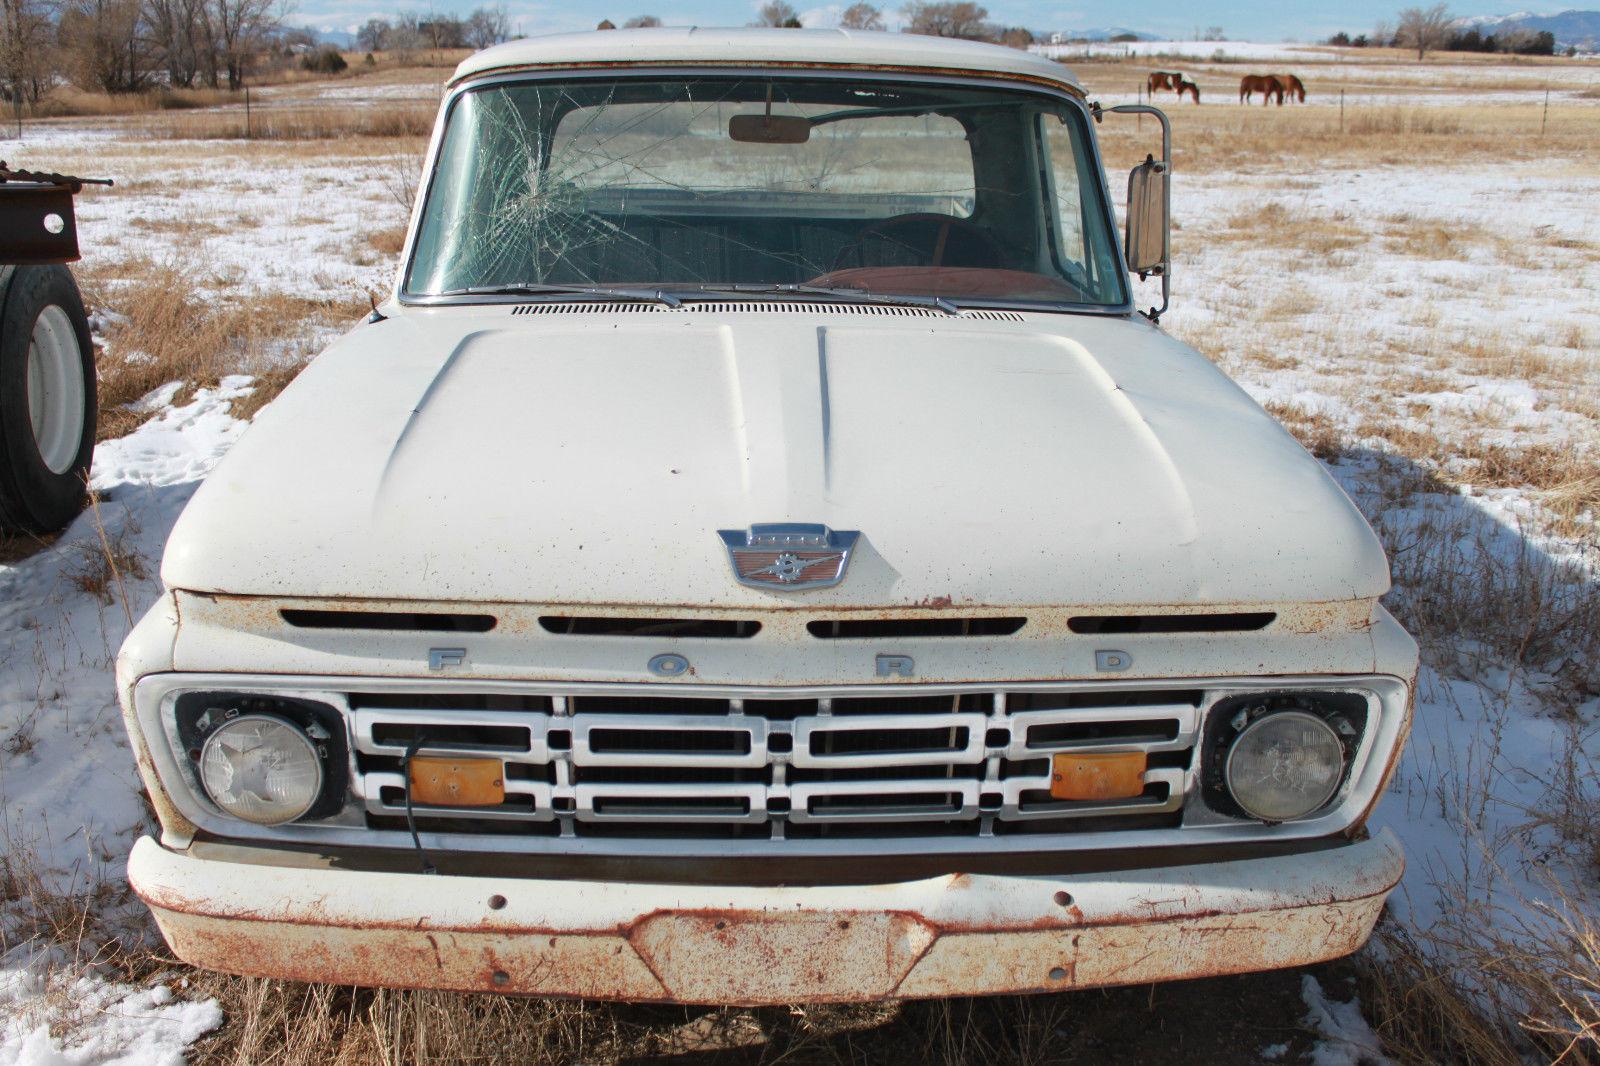 1964 ford f 100 short bed pick up truck vintage classic ford other pickups 1964 for sale. Black Bedroom Furniture Sets. Home Design Ideas